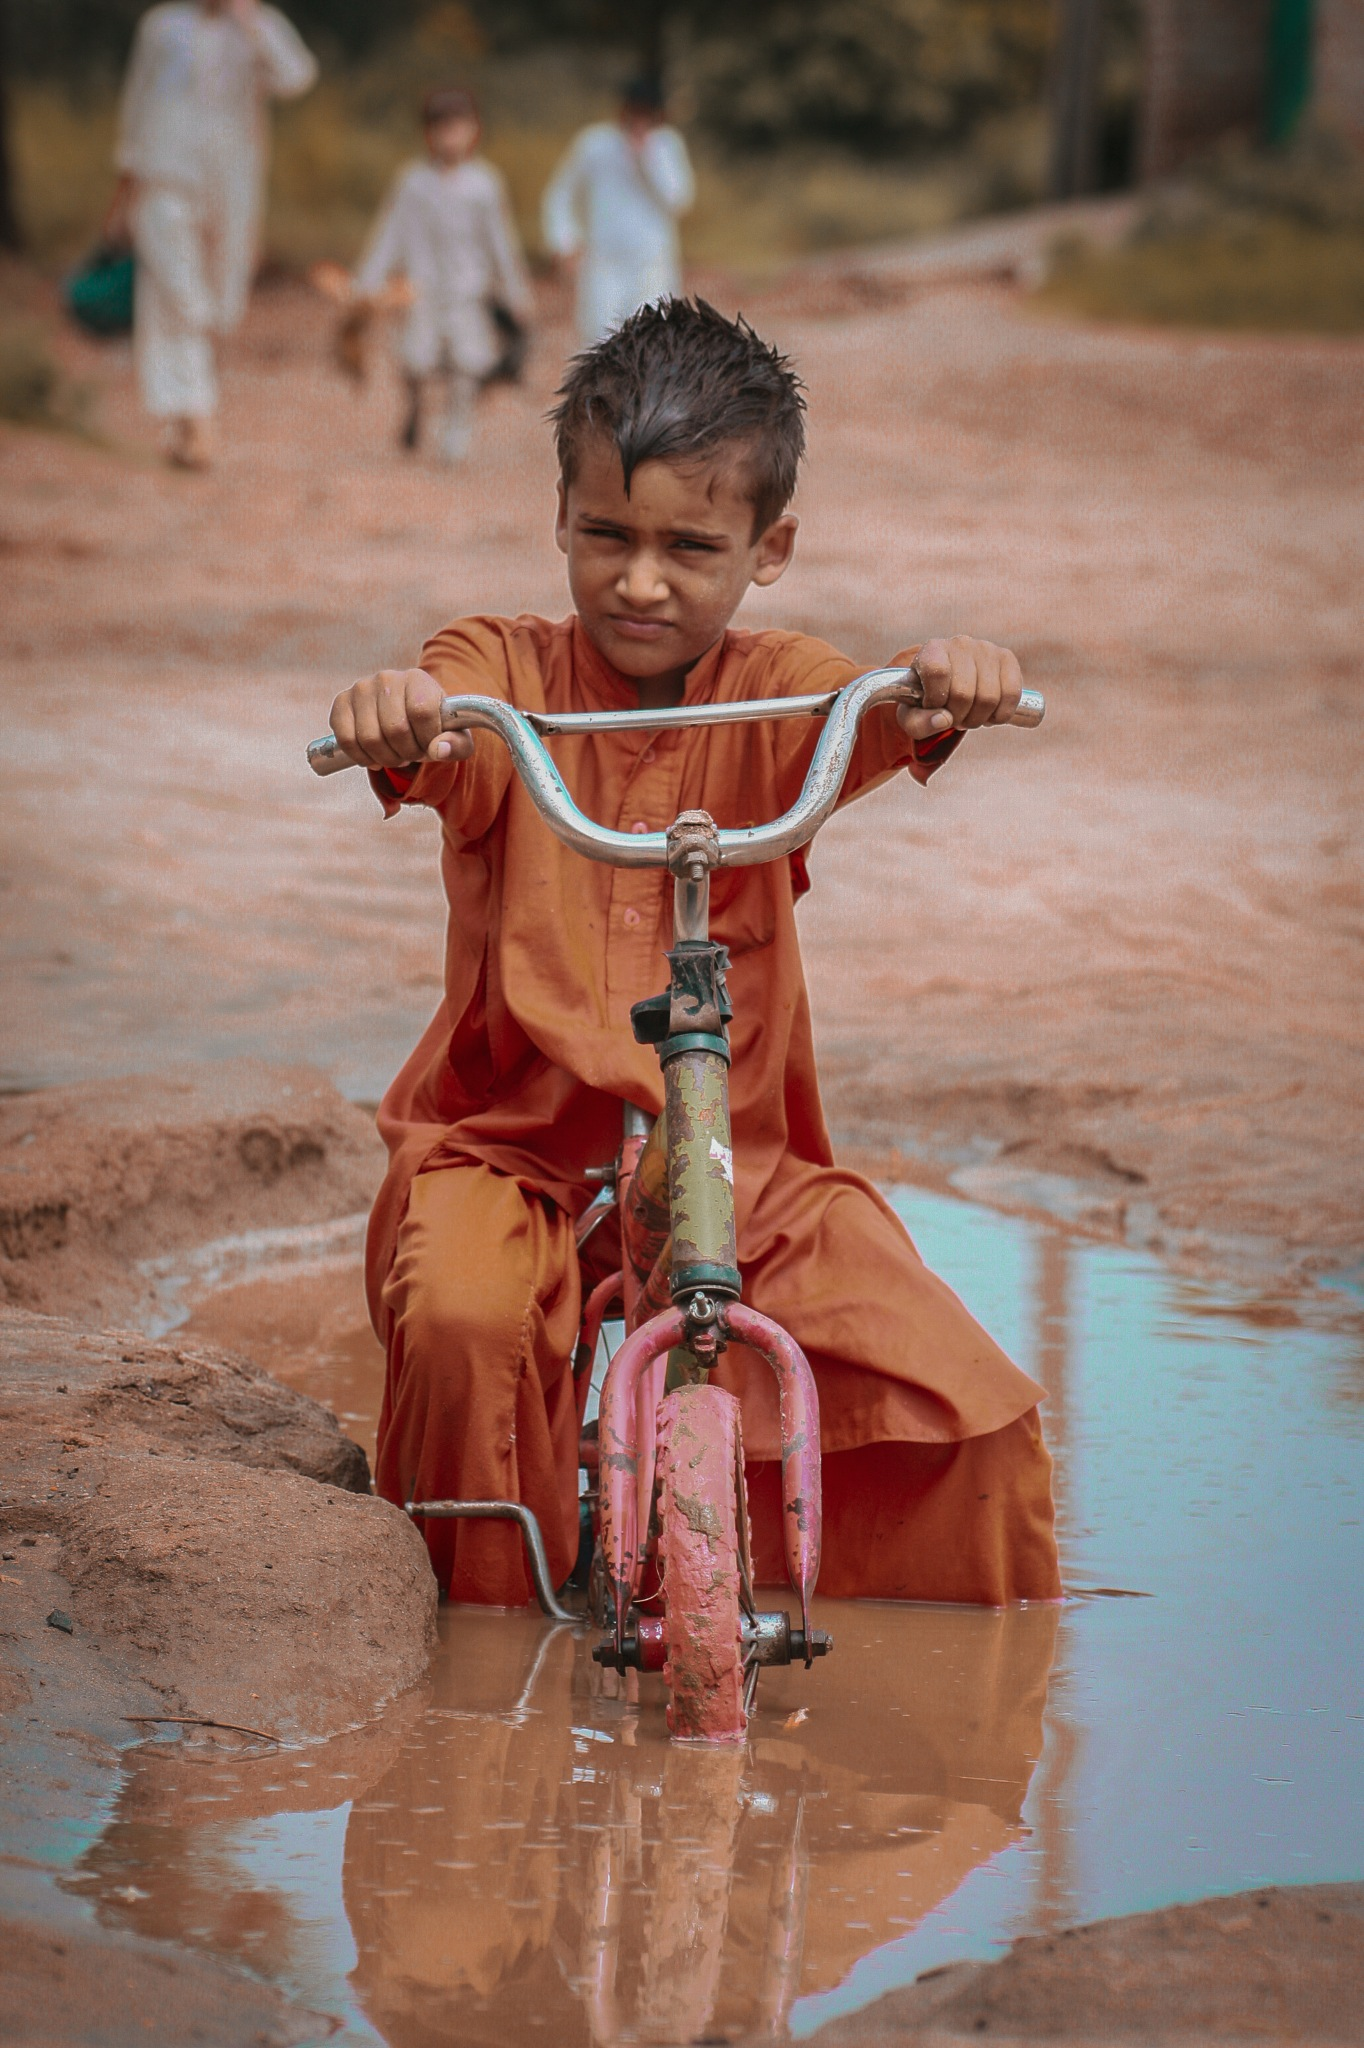 Childportrait by Shahan Khan